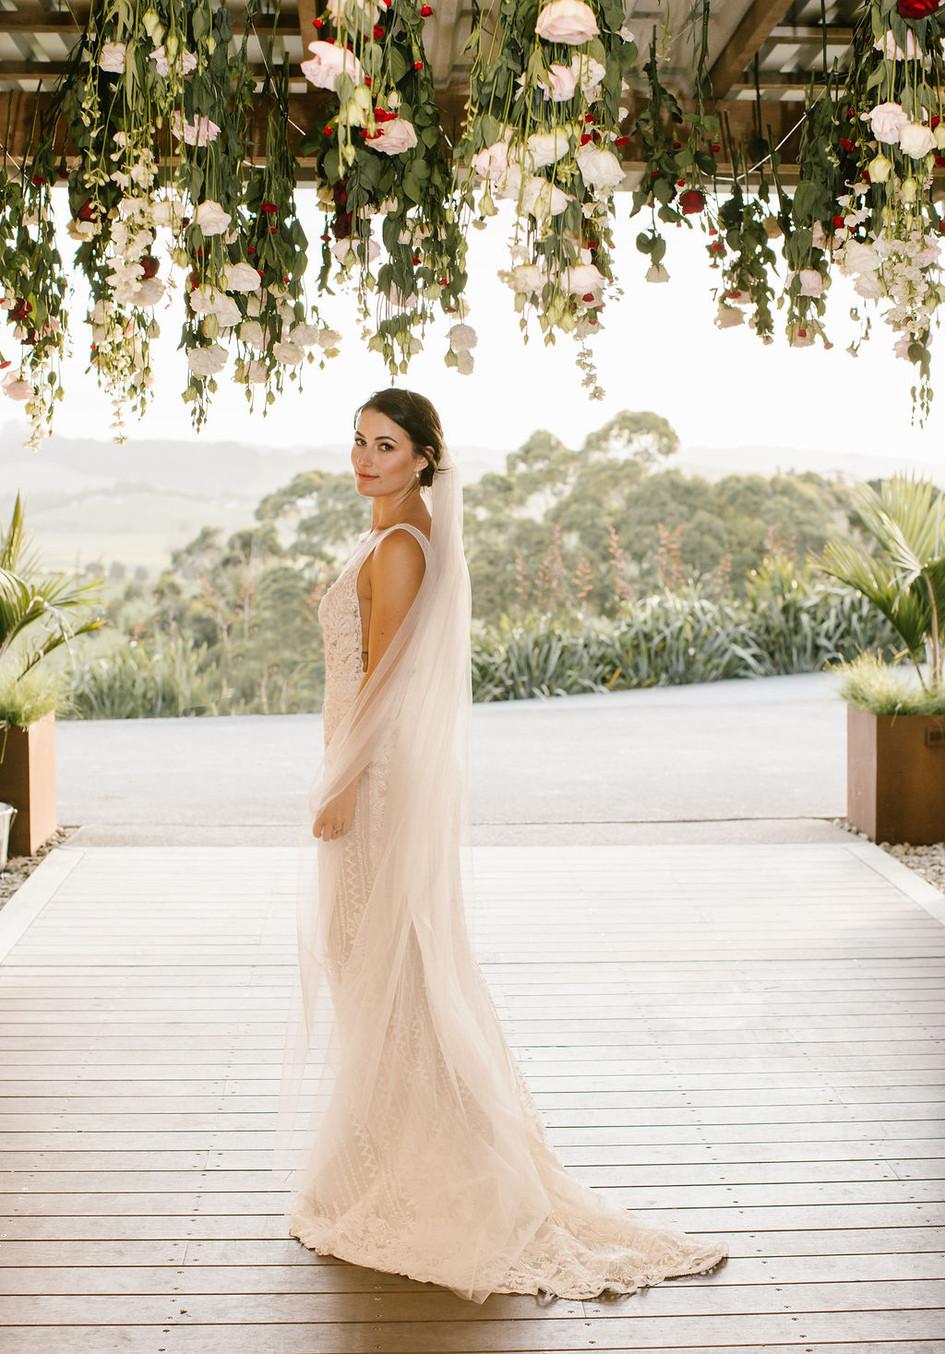 oss_auckland_Wedding_planner_stylist.jpg